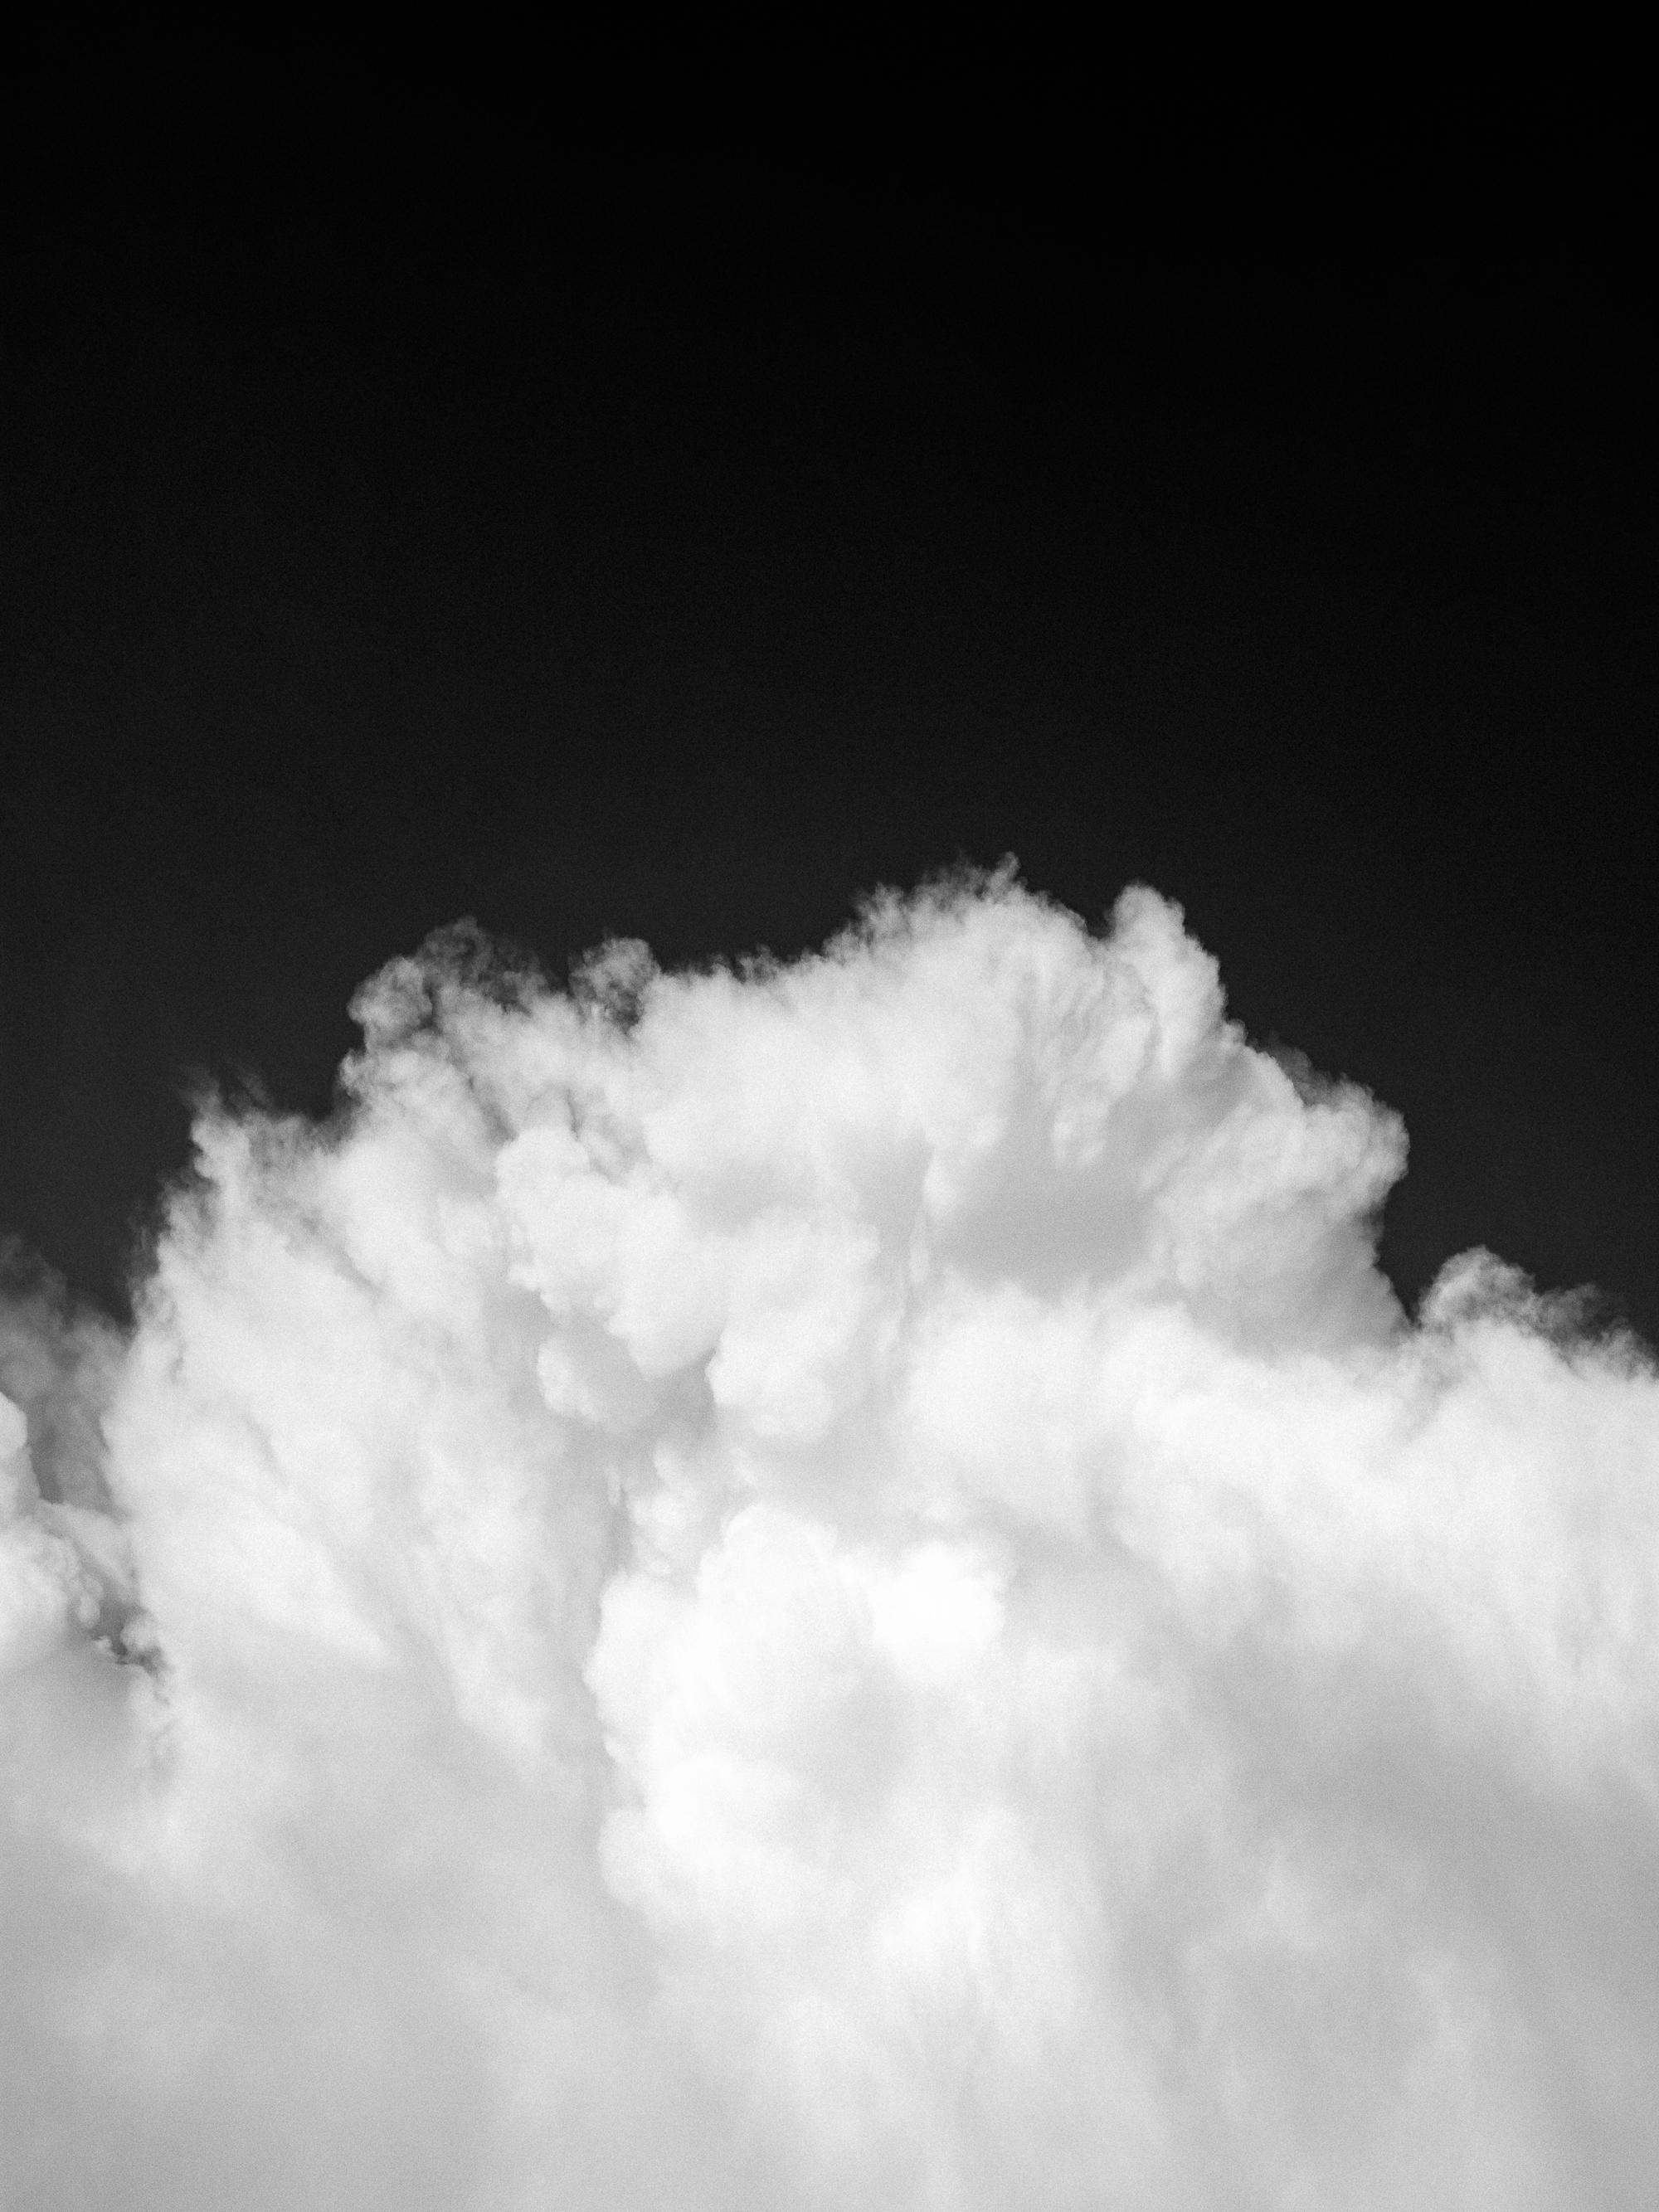 TWP-KarlAntonBjorkman--5.jpg